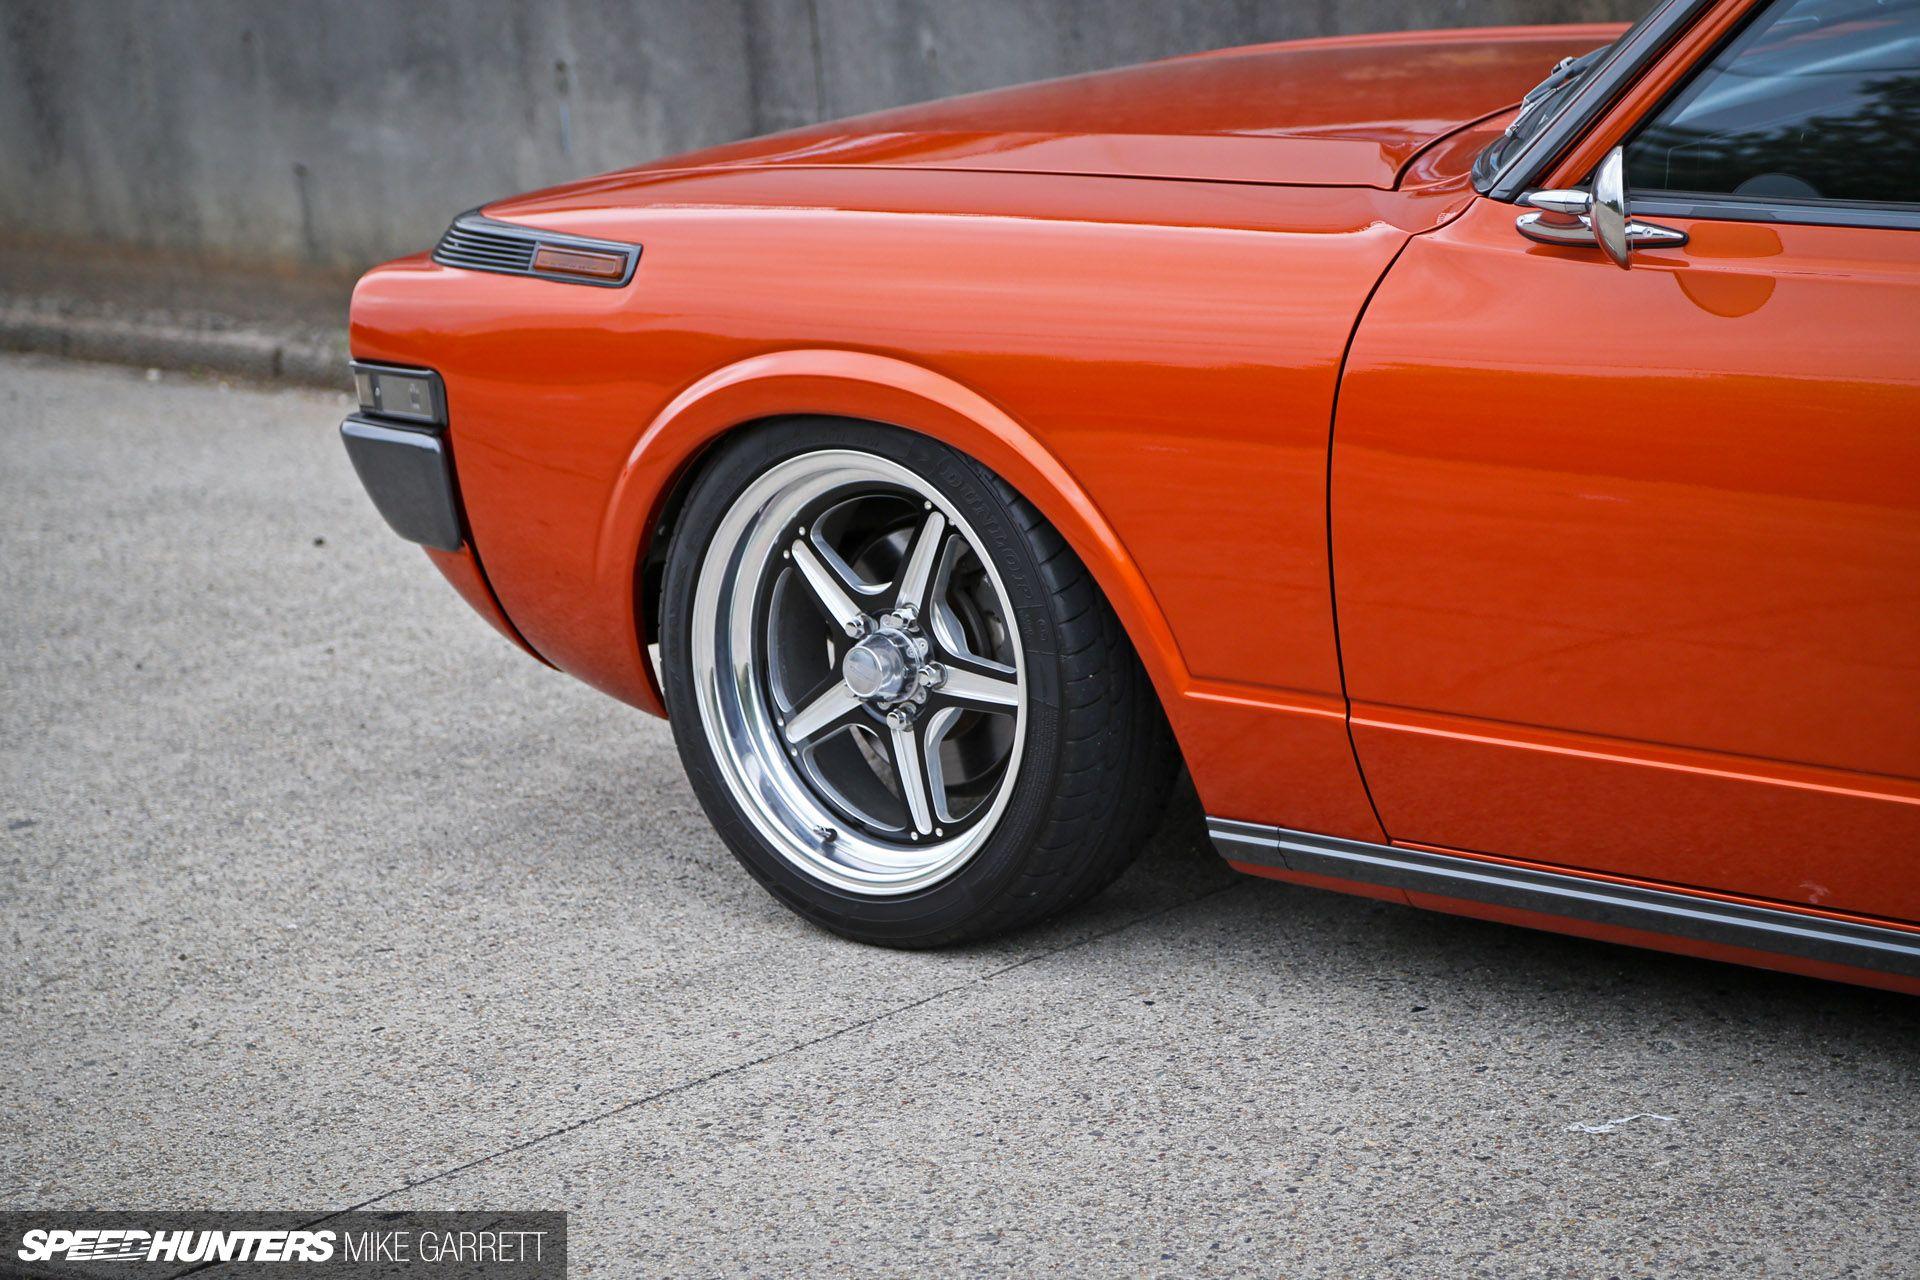 1970s Toyota Crown station wagon